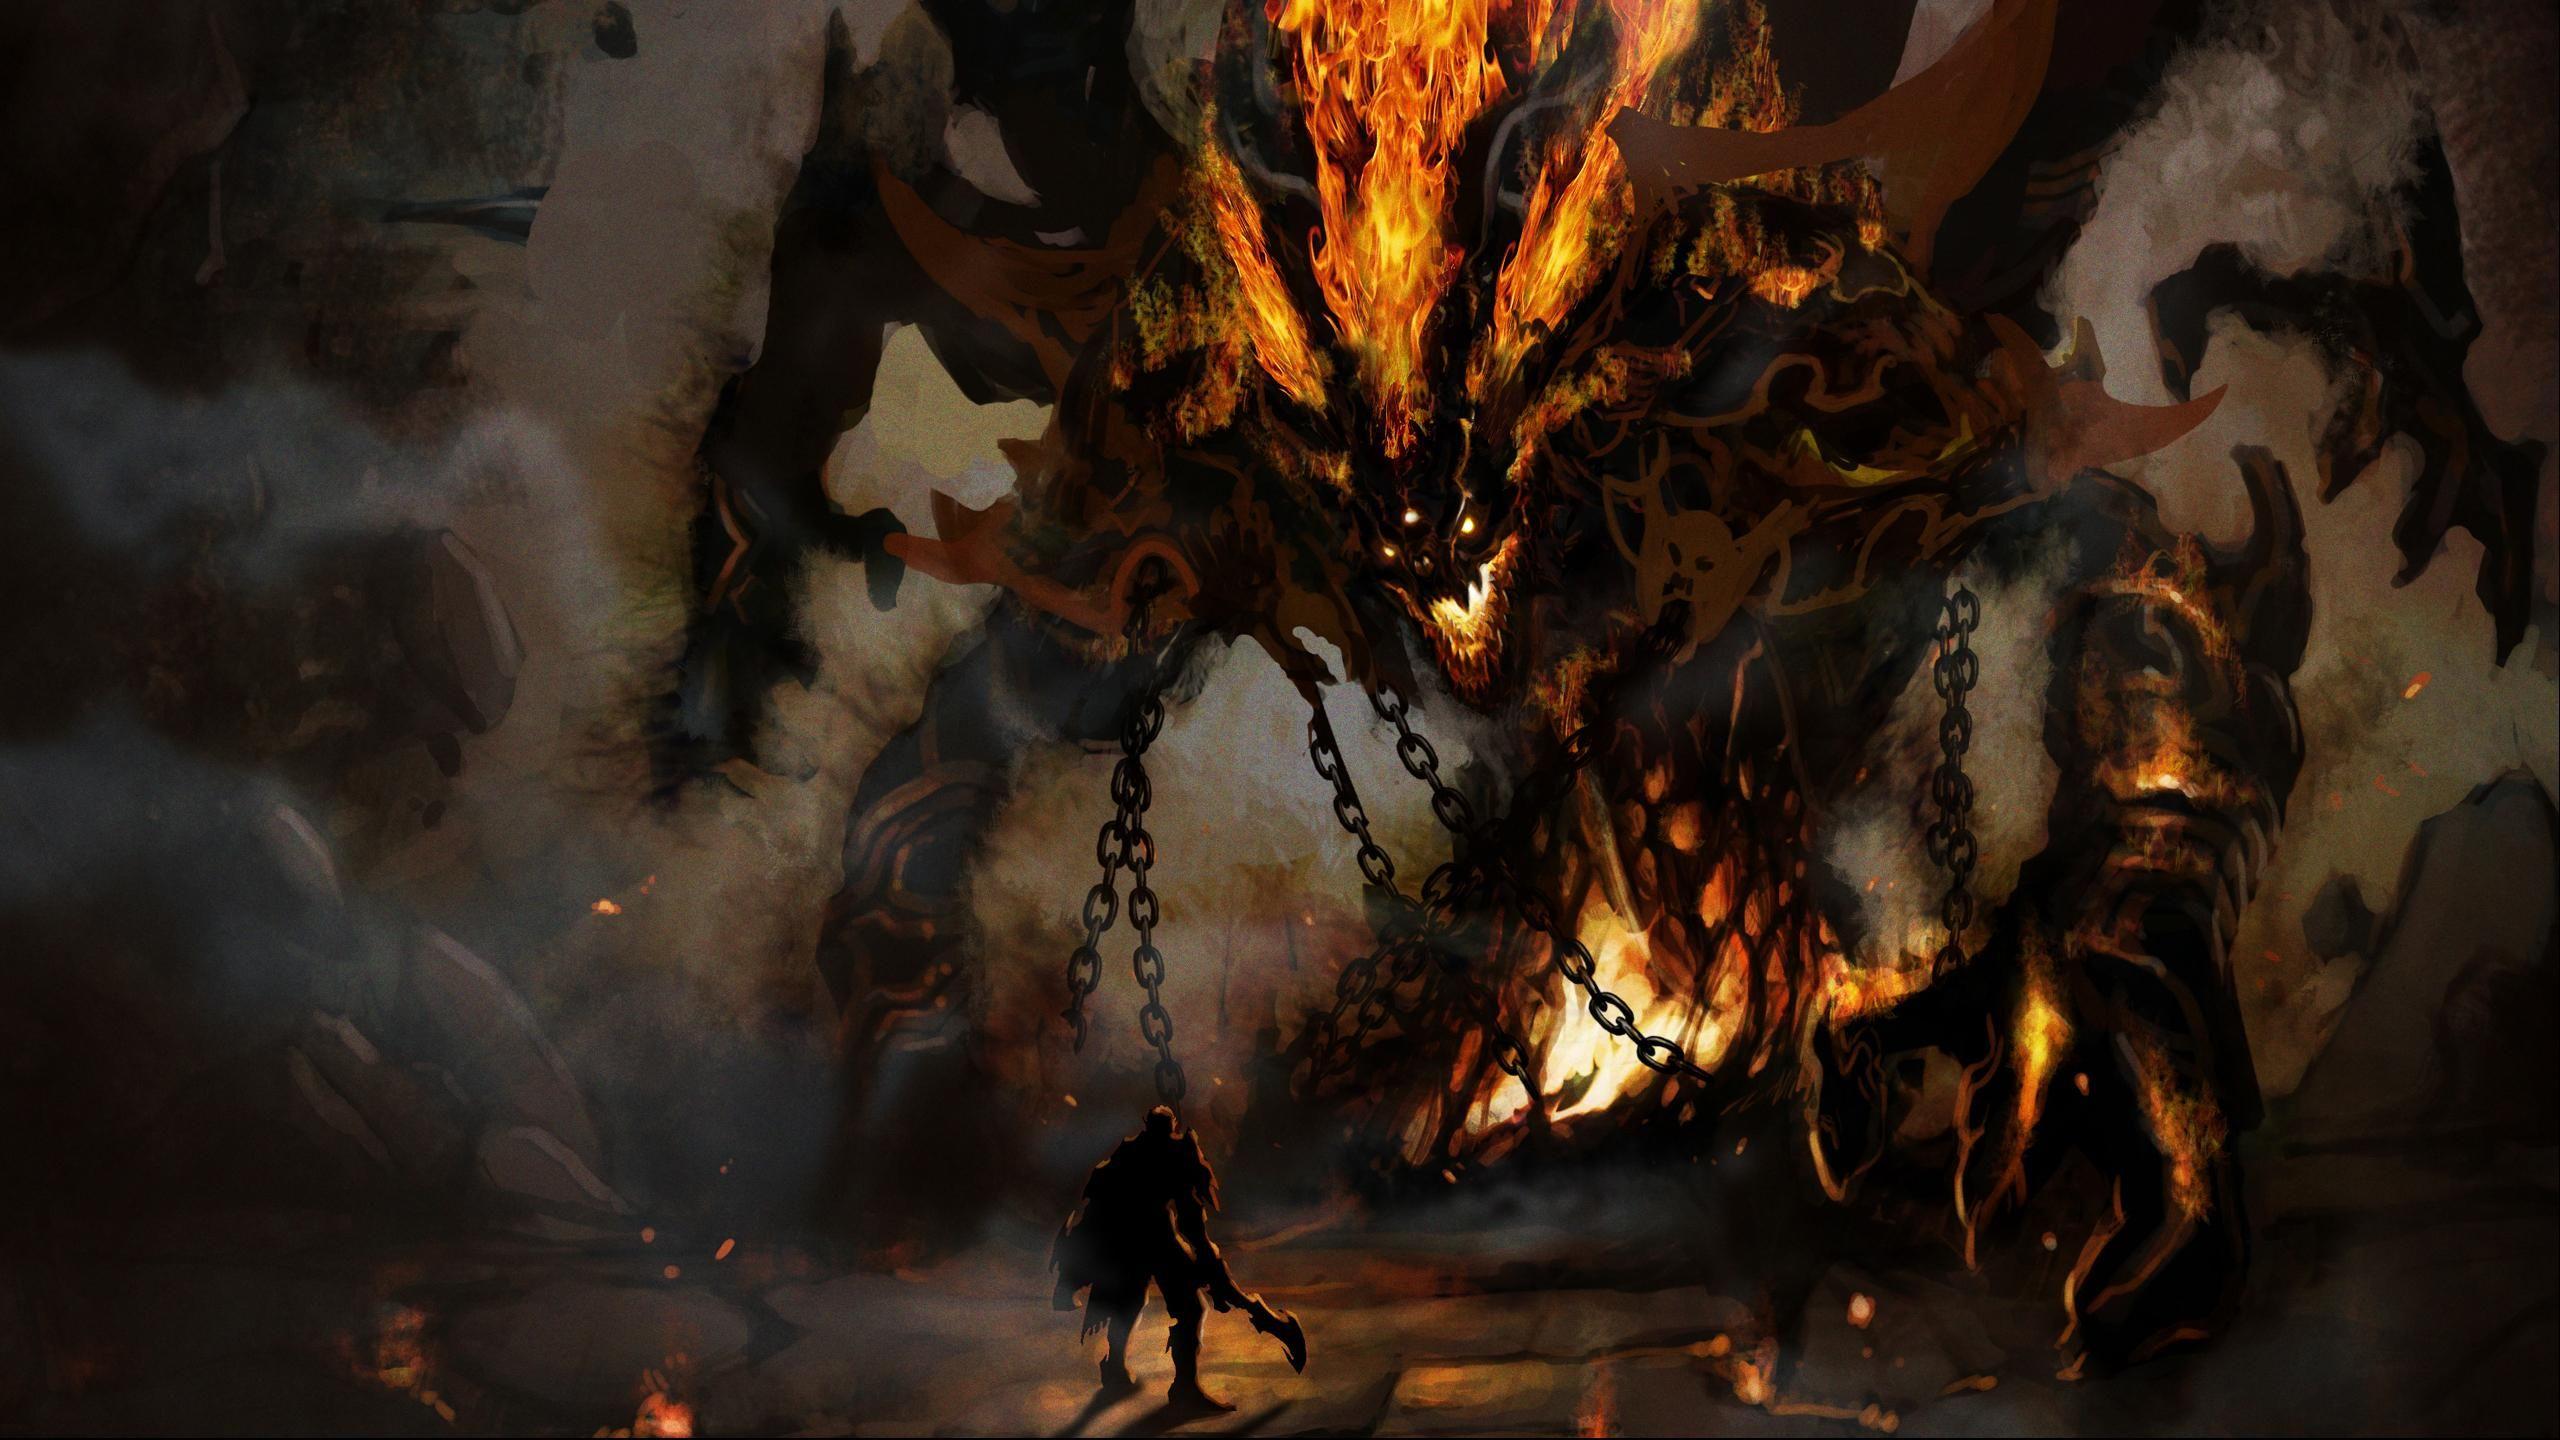 Giant Monster Wallpaper En 2019 Monstruo De Fantasía